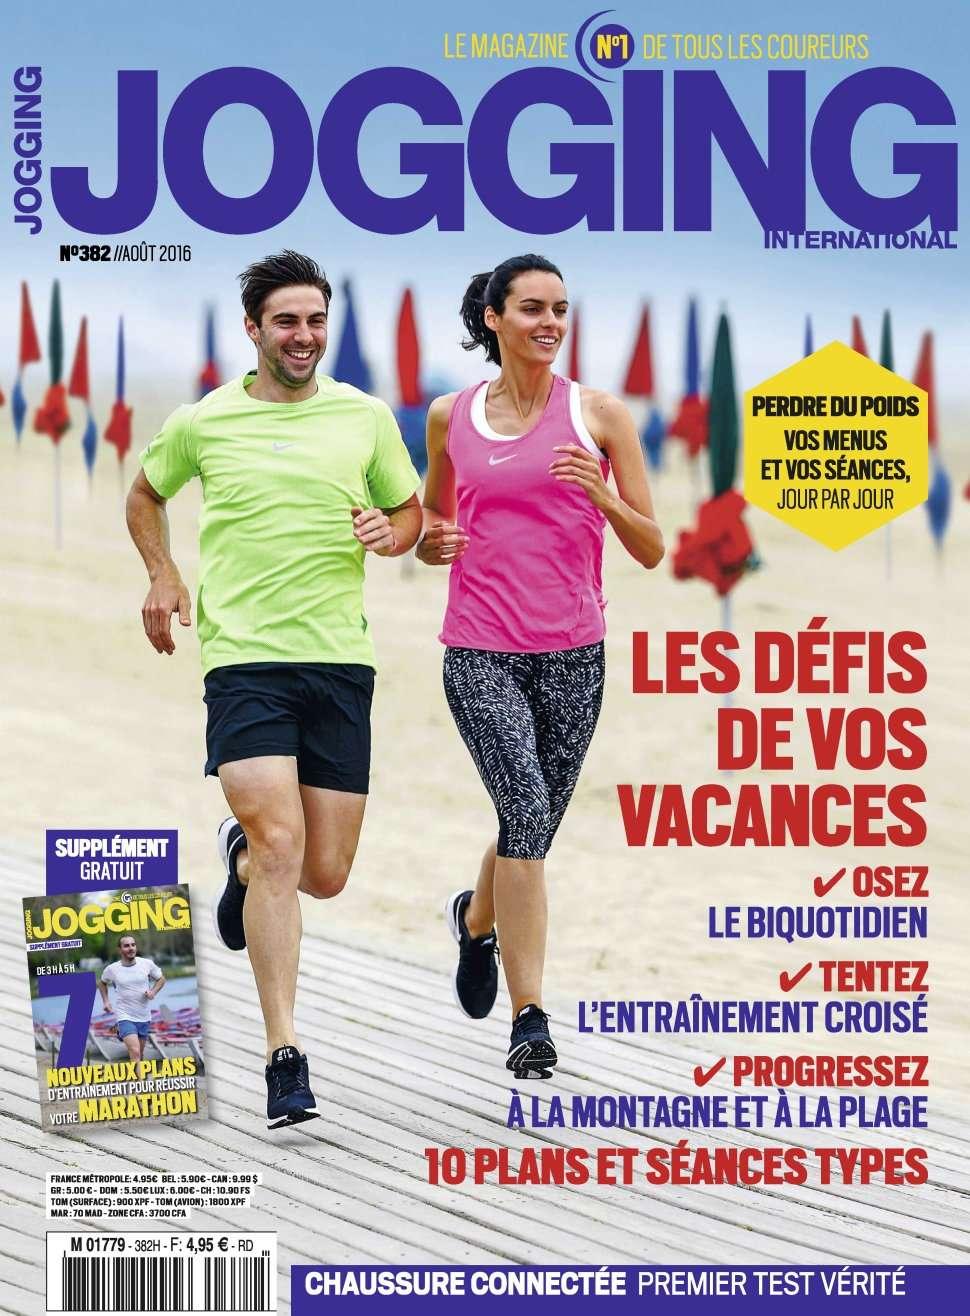 Jogging International 382 - Aout 2016